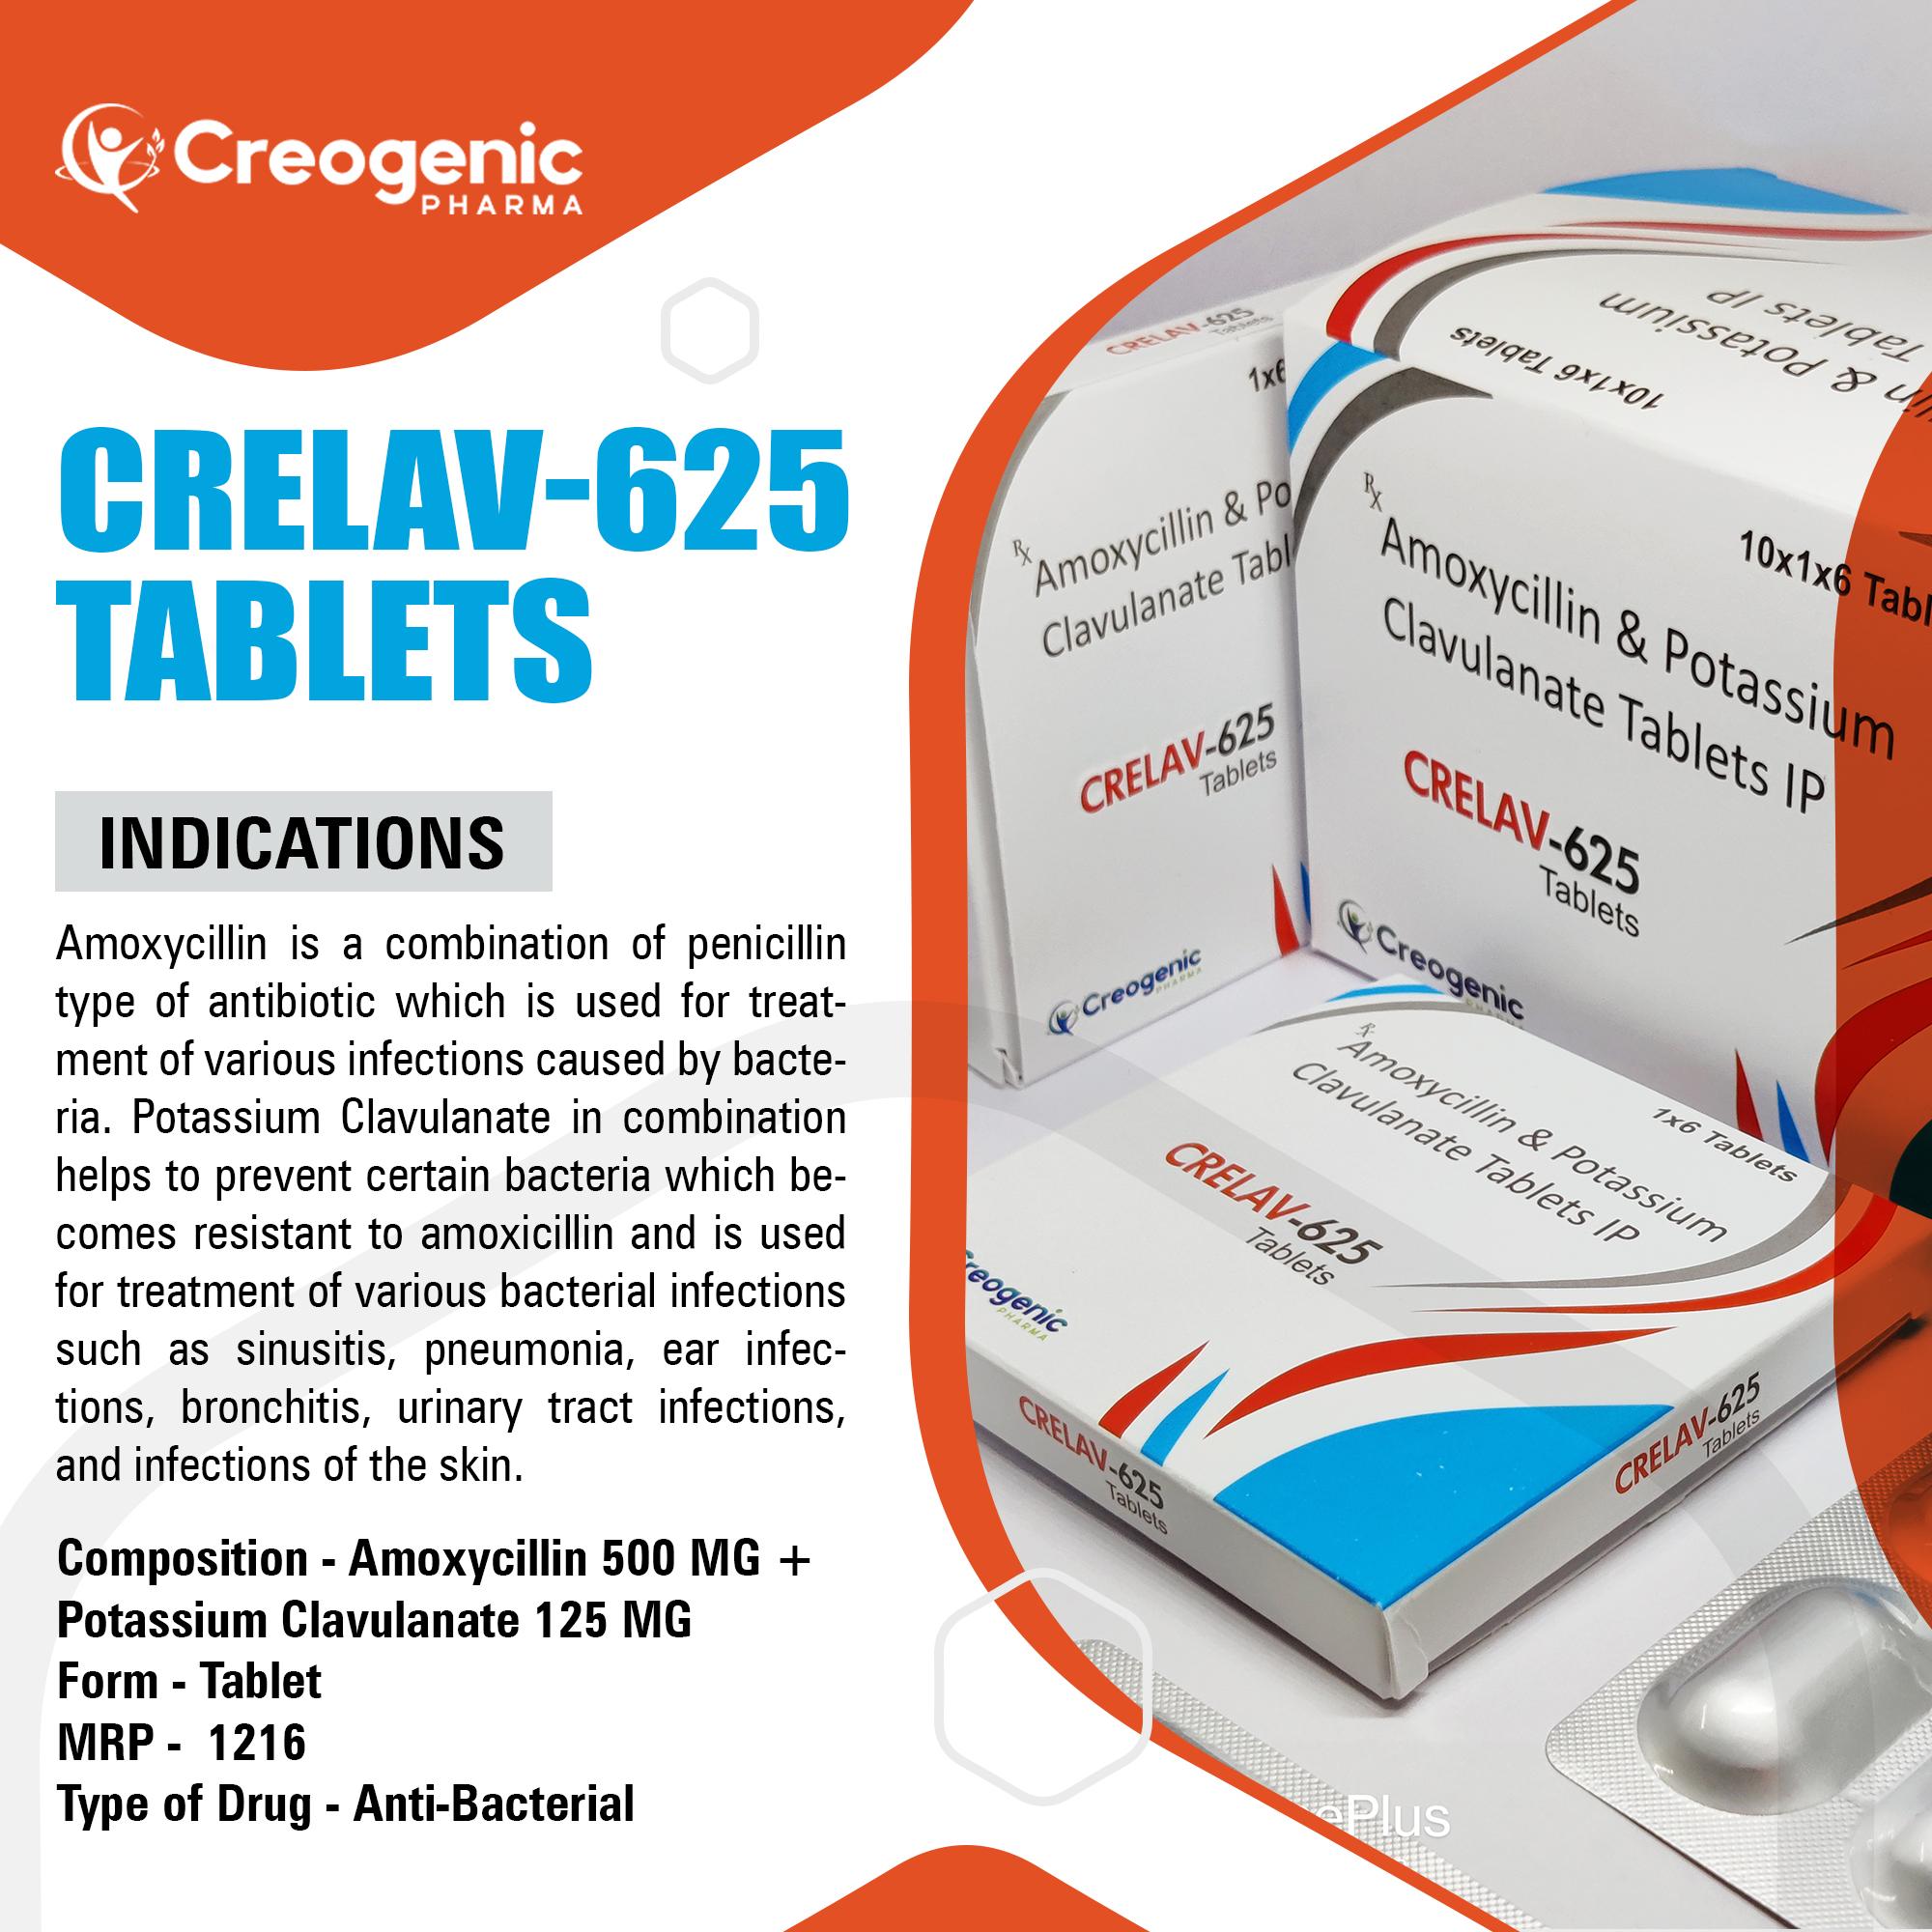 Amoxycilin 500 MG + Potassium Clavulanate 125 MG